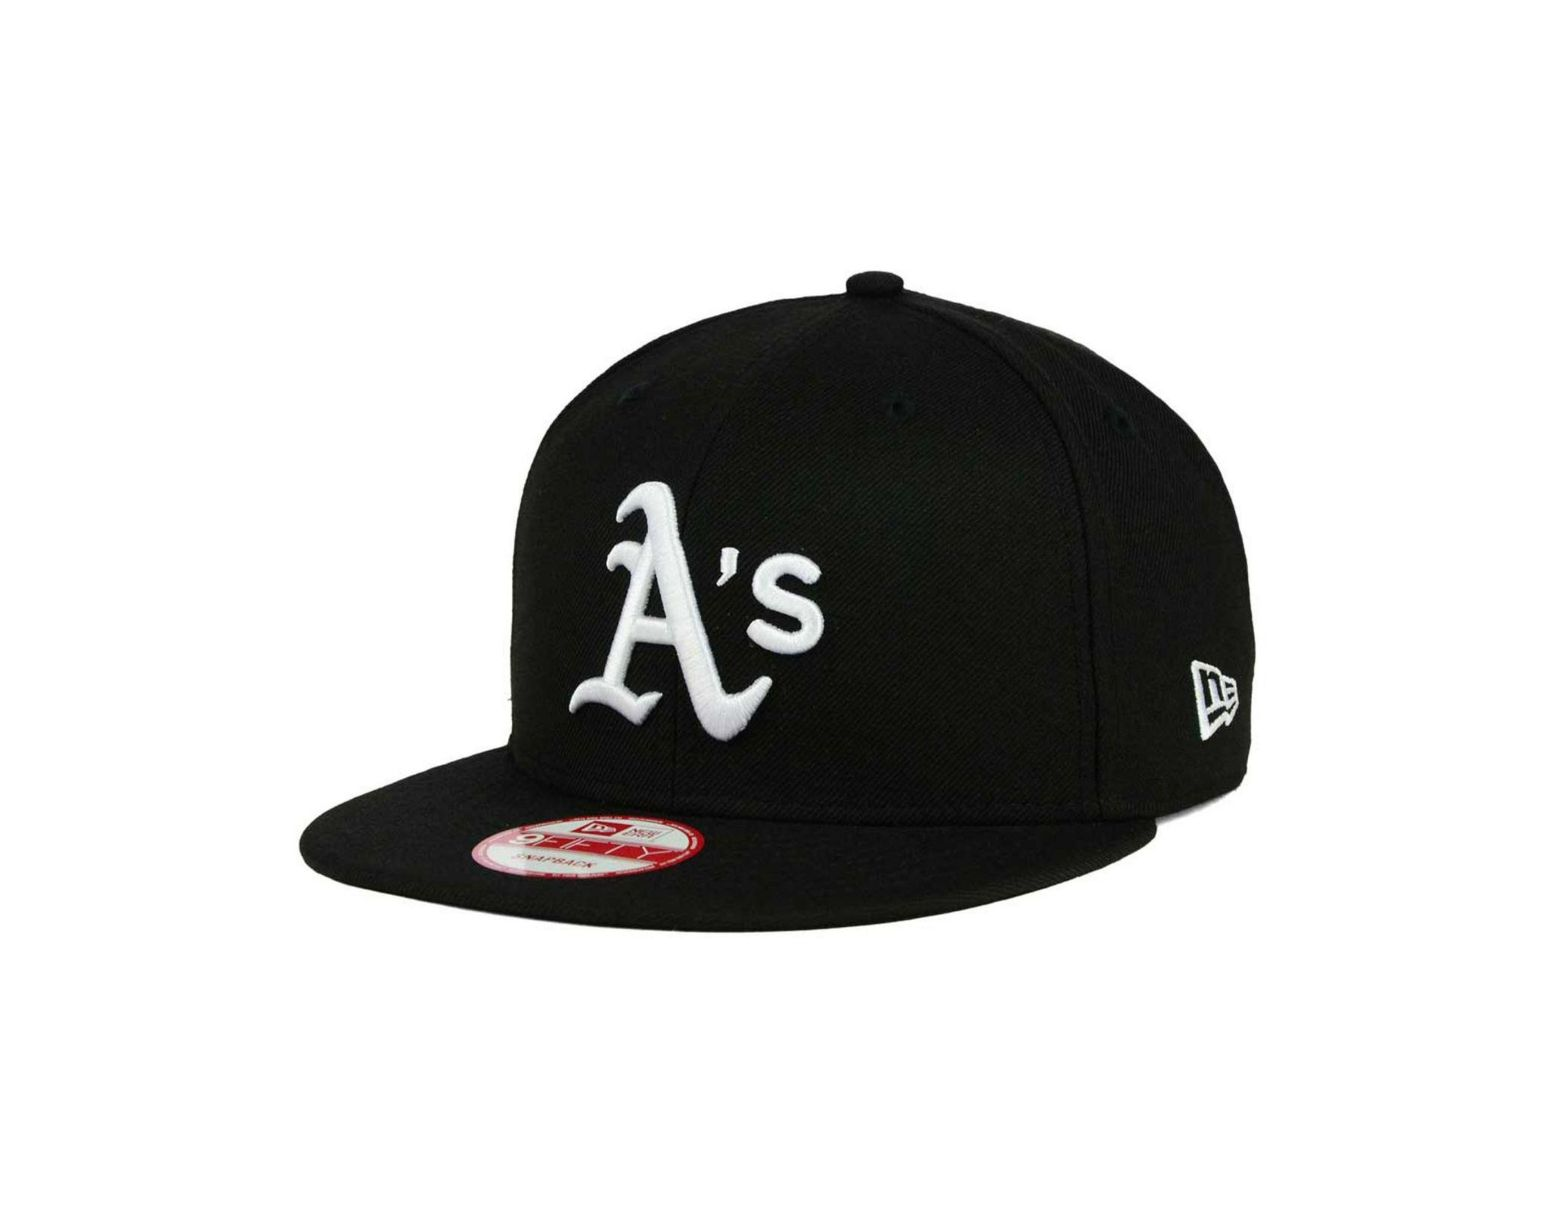 separation shoes 37c7c 49b8b KTZ Oakland Athletics B-dub 9fifty Snapback Cap in Black for Men - Lyst